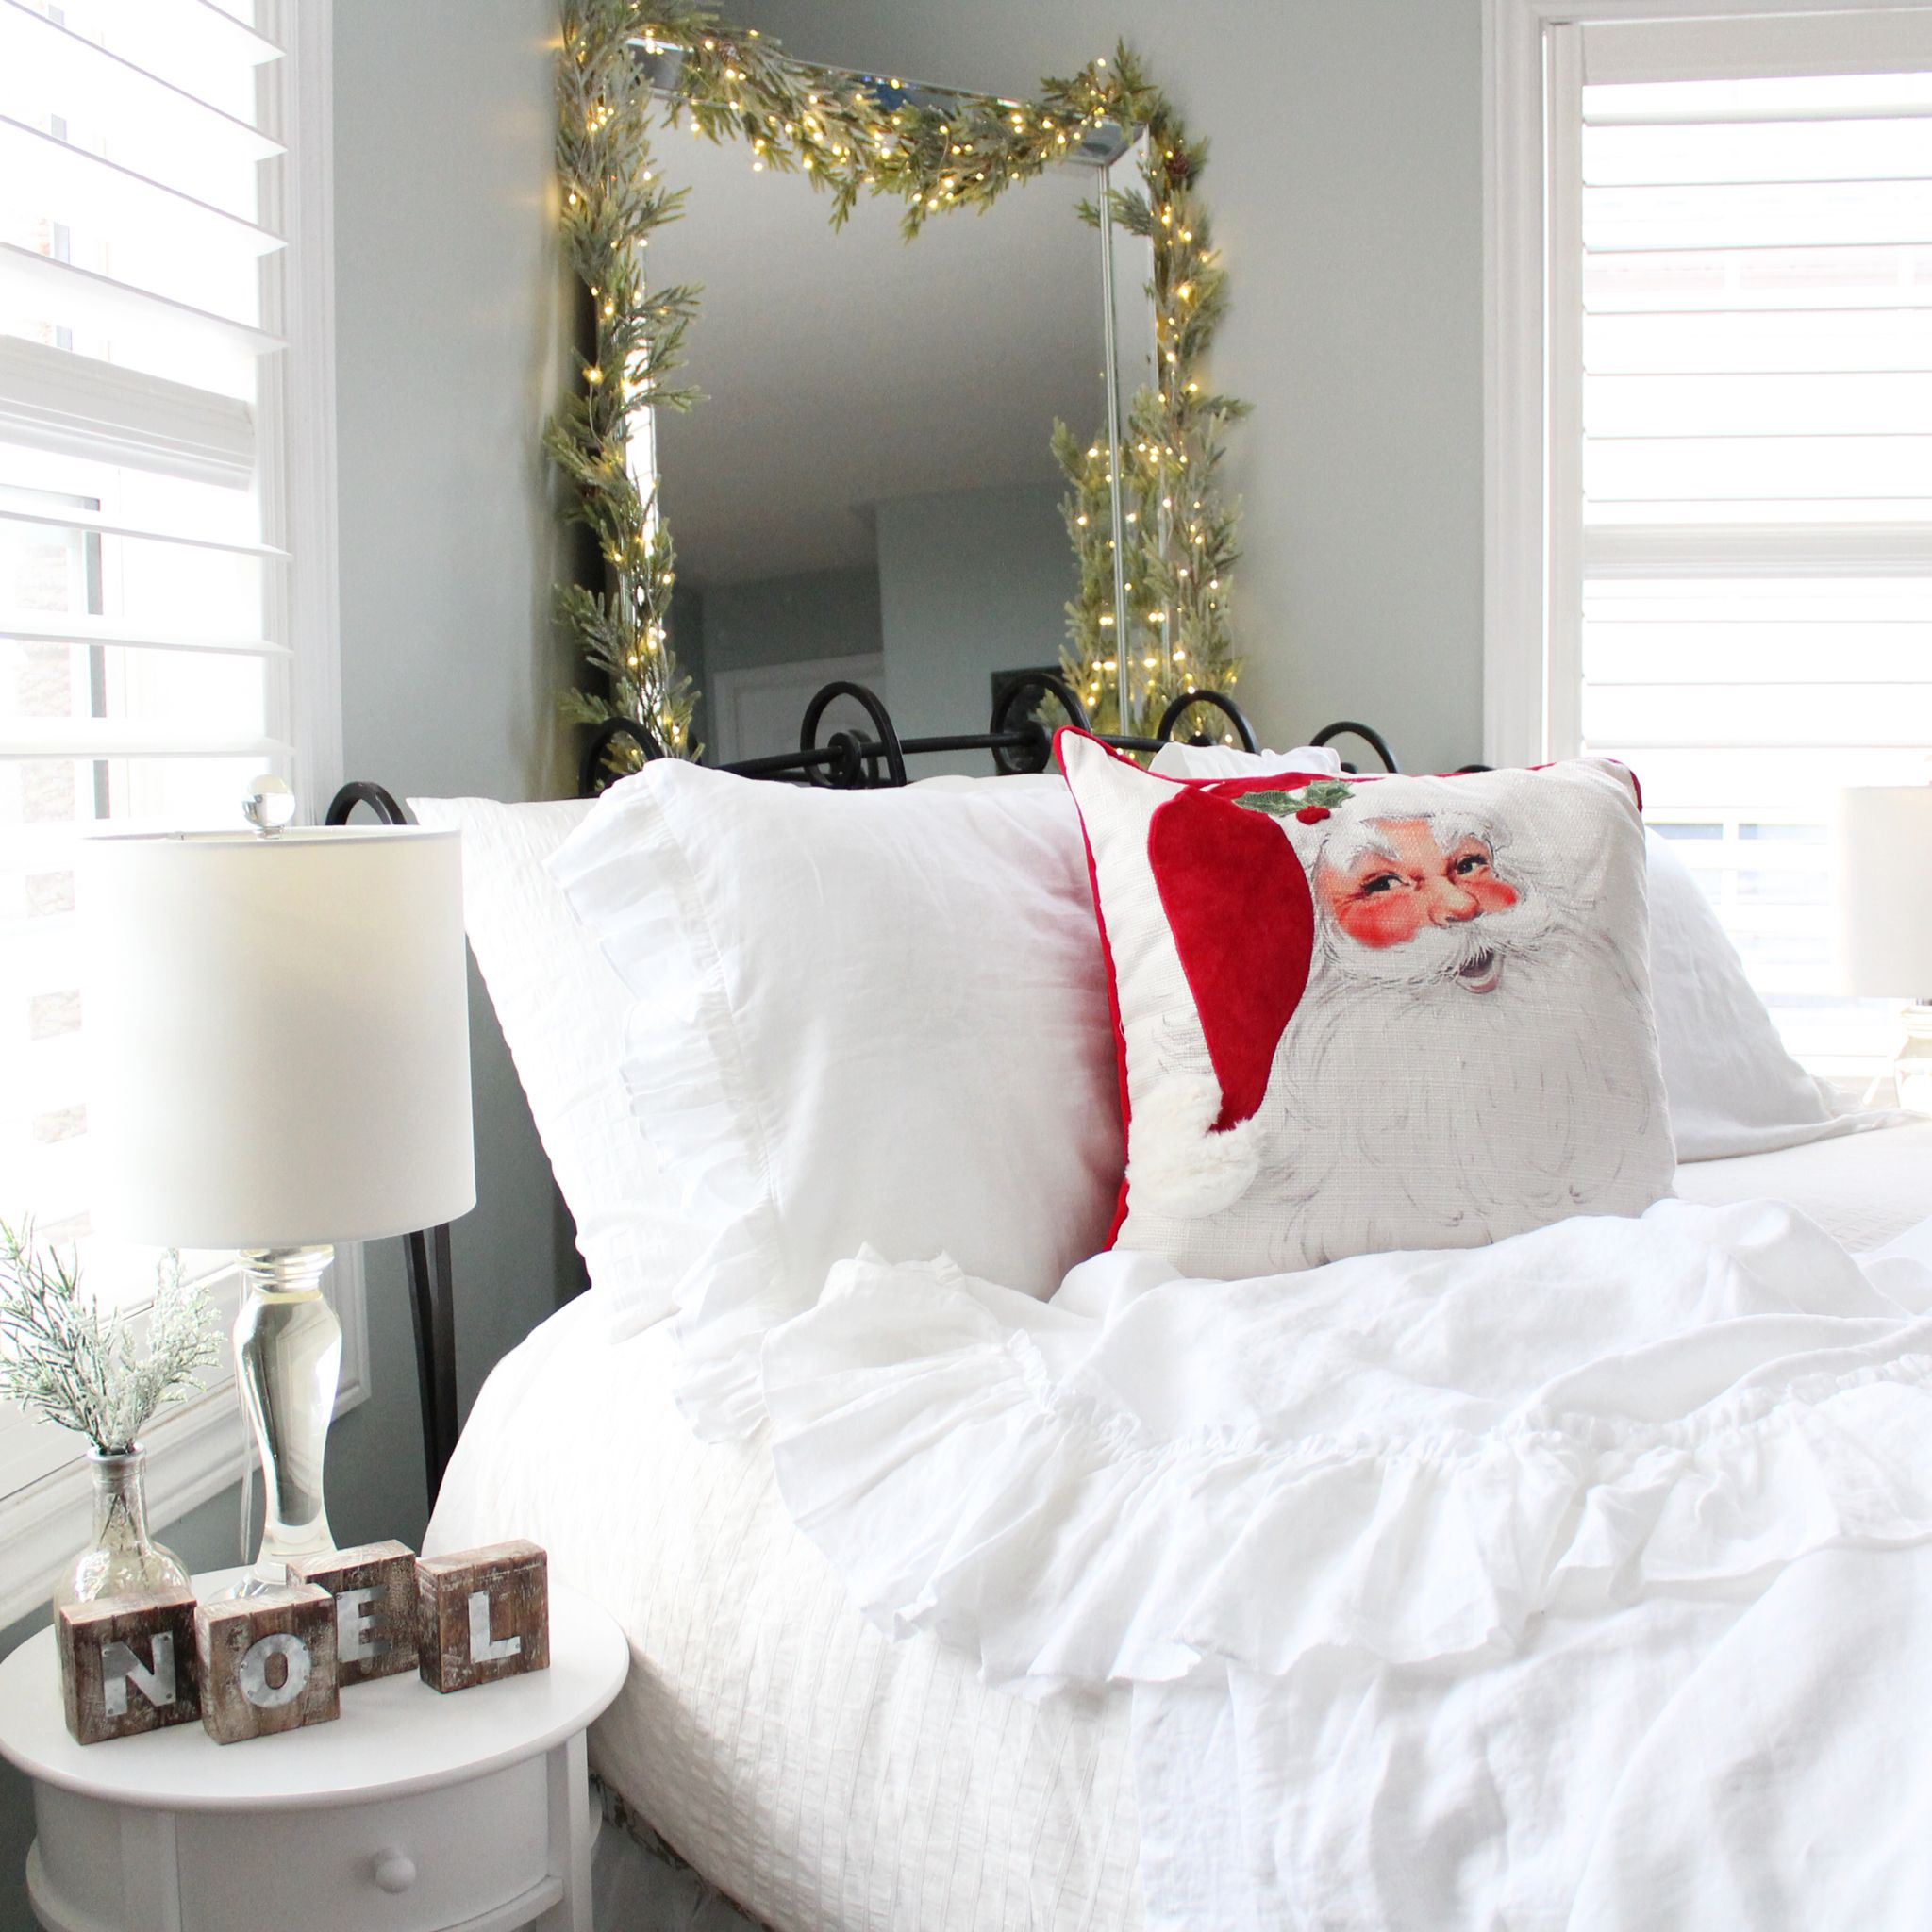 White Christmas Bedroom inspo, Home decor, Bed pillows